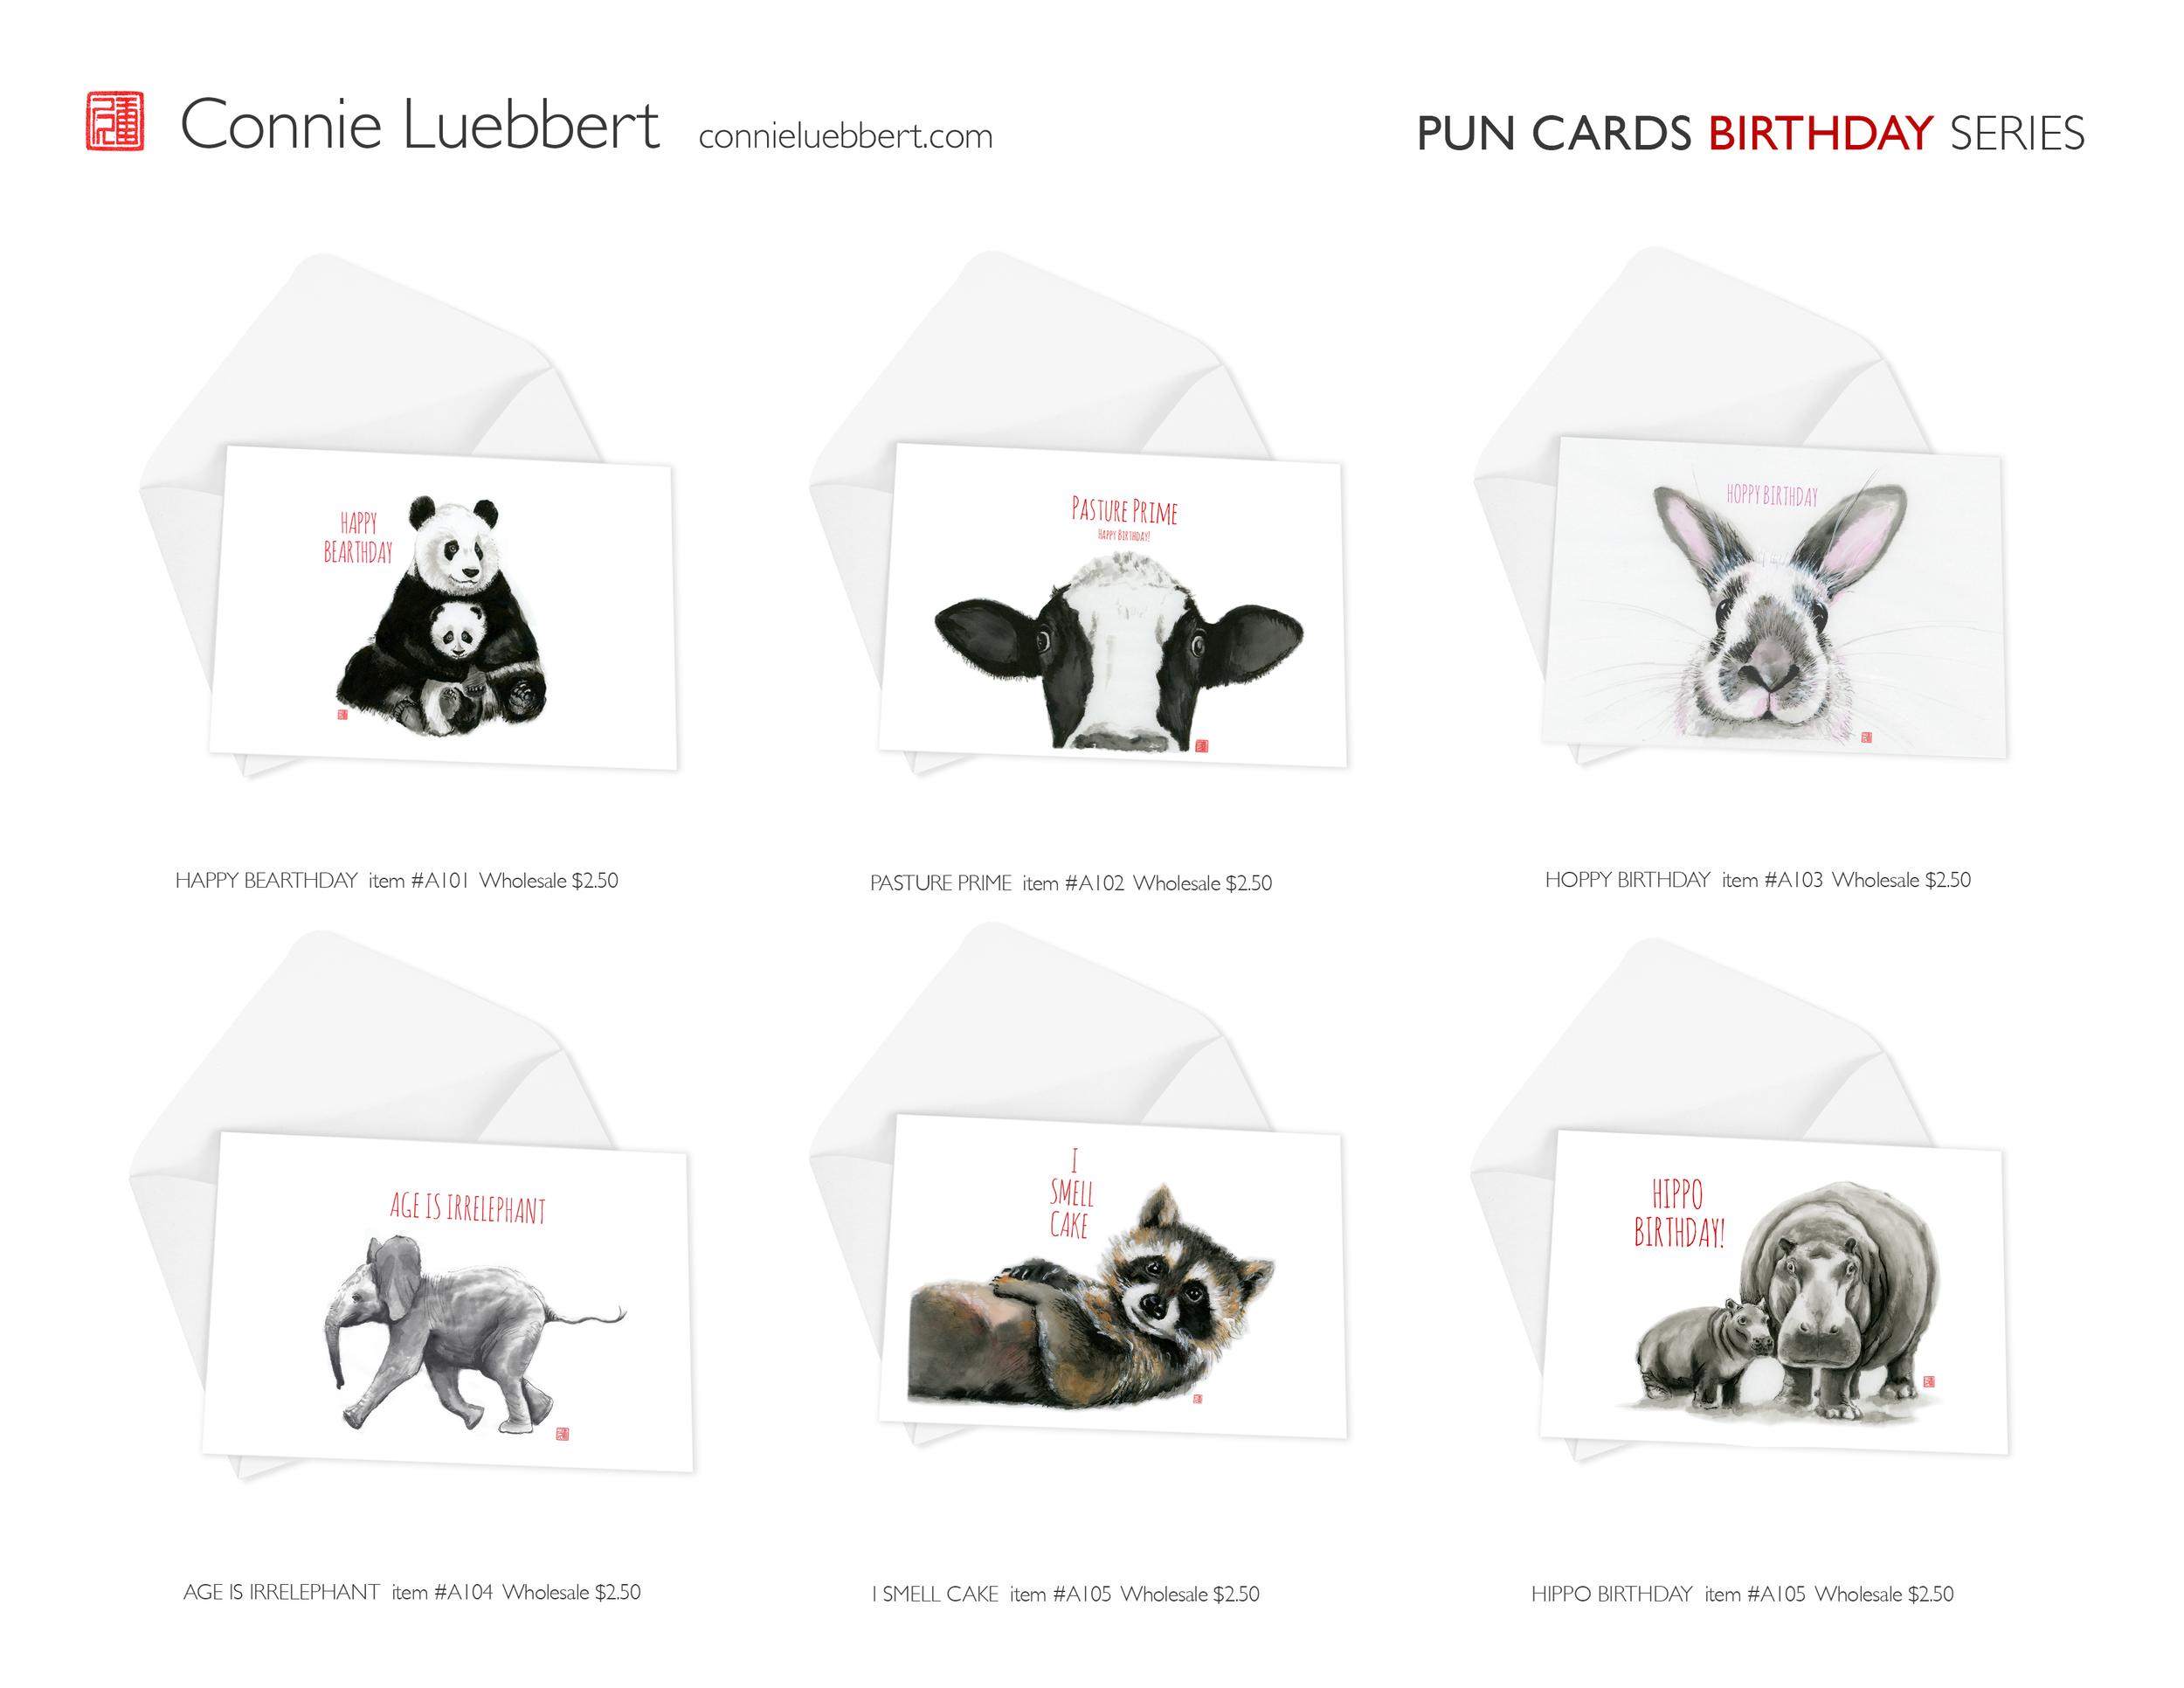 - PUN CARDS: BIRTHDAY SERIES